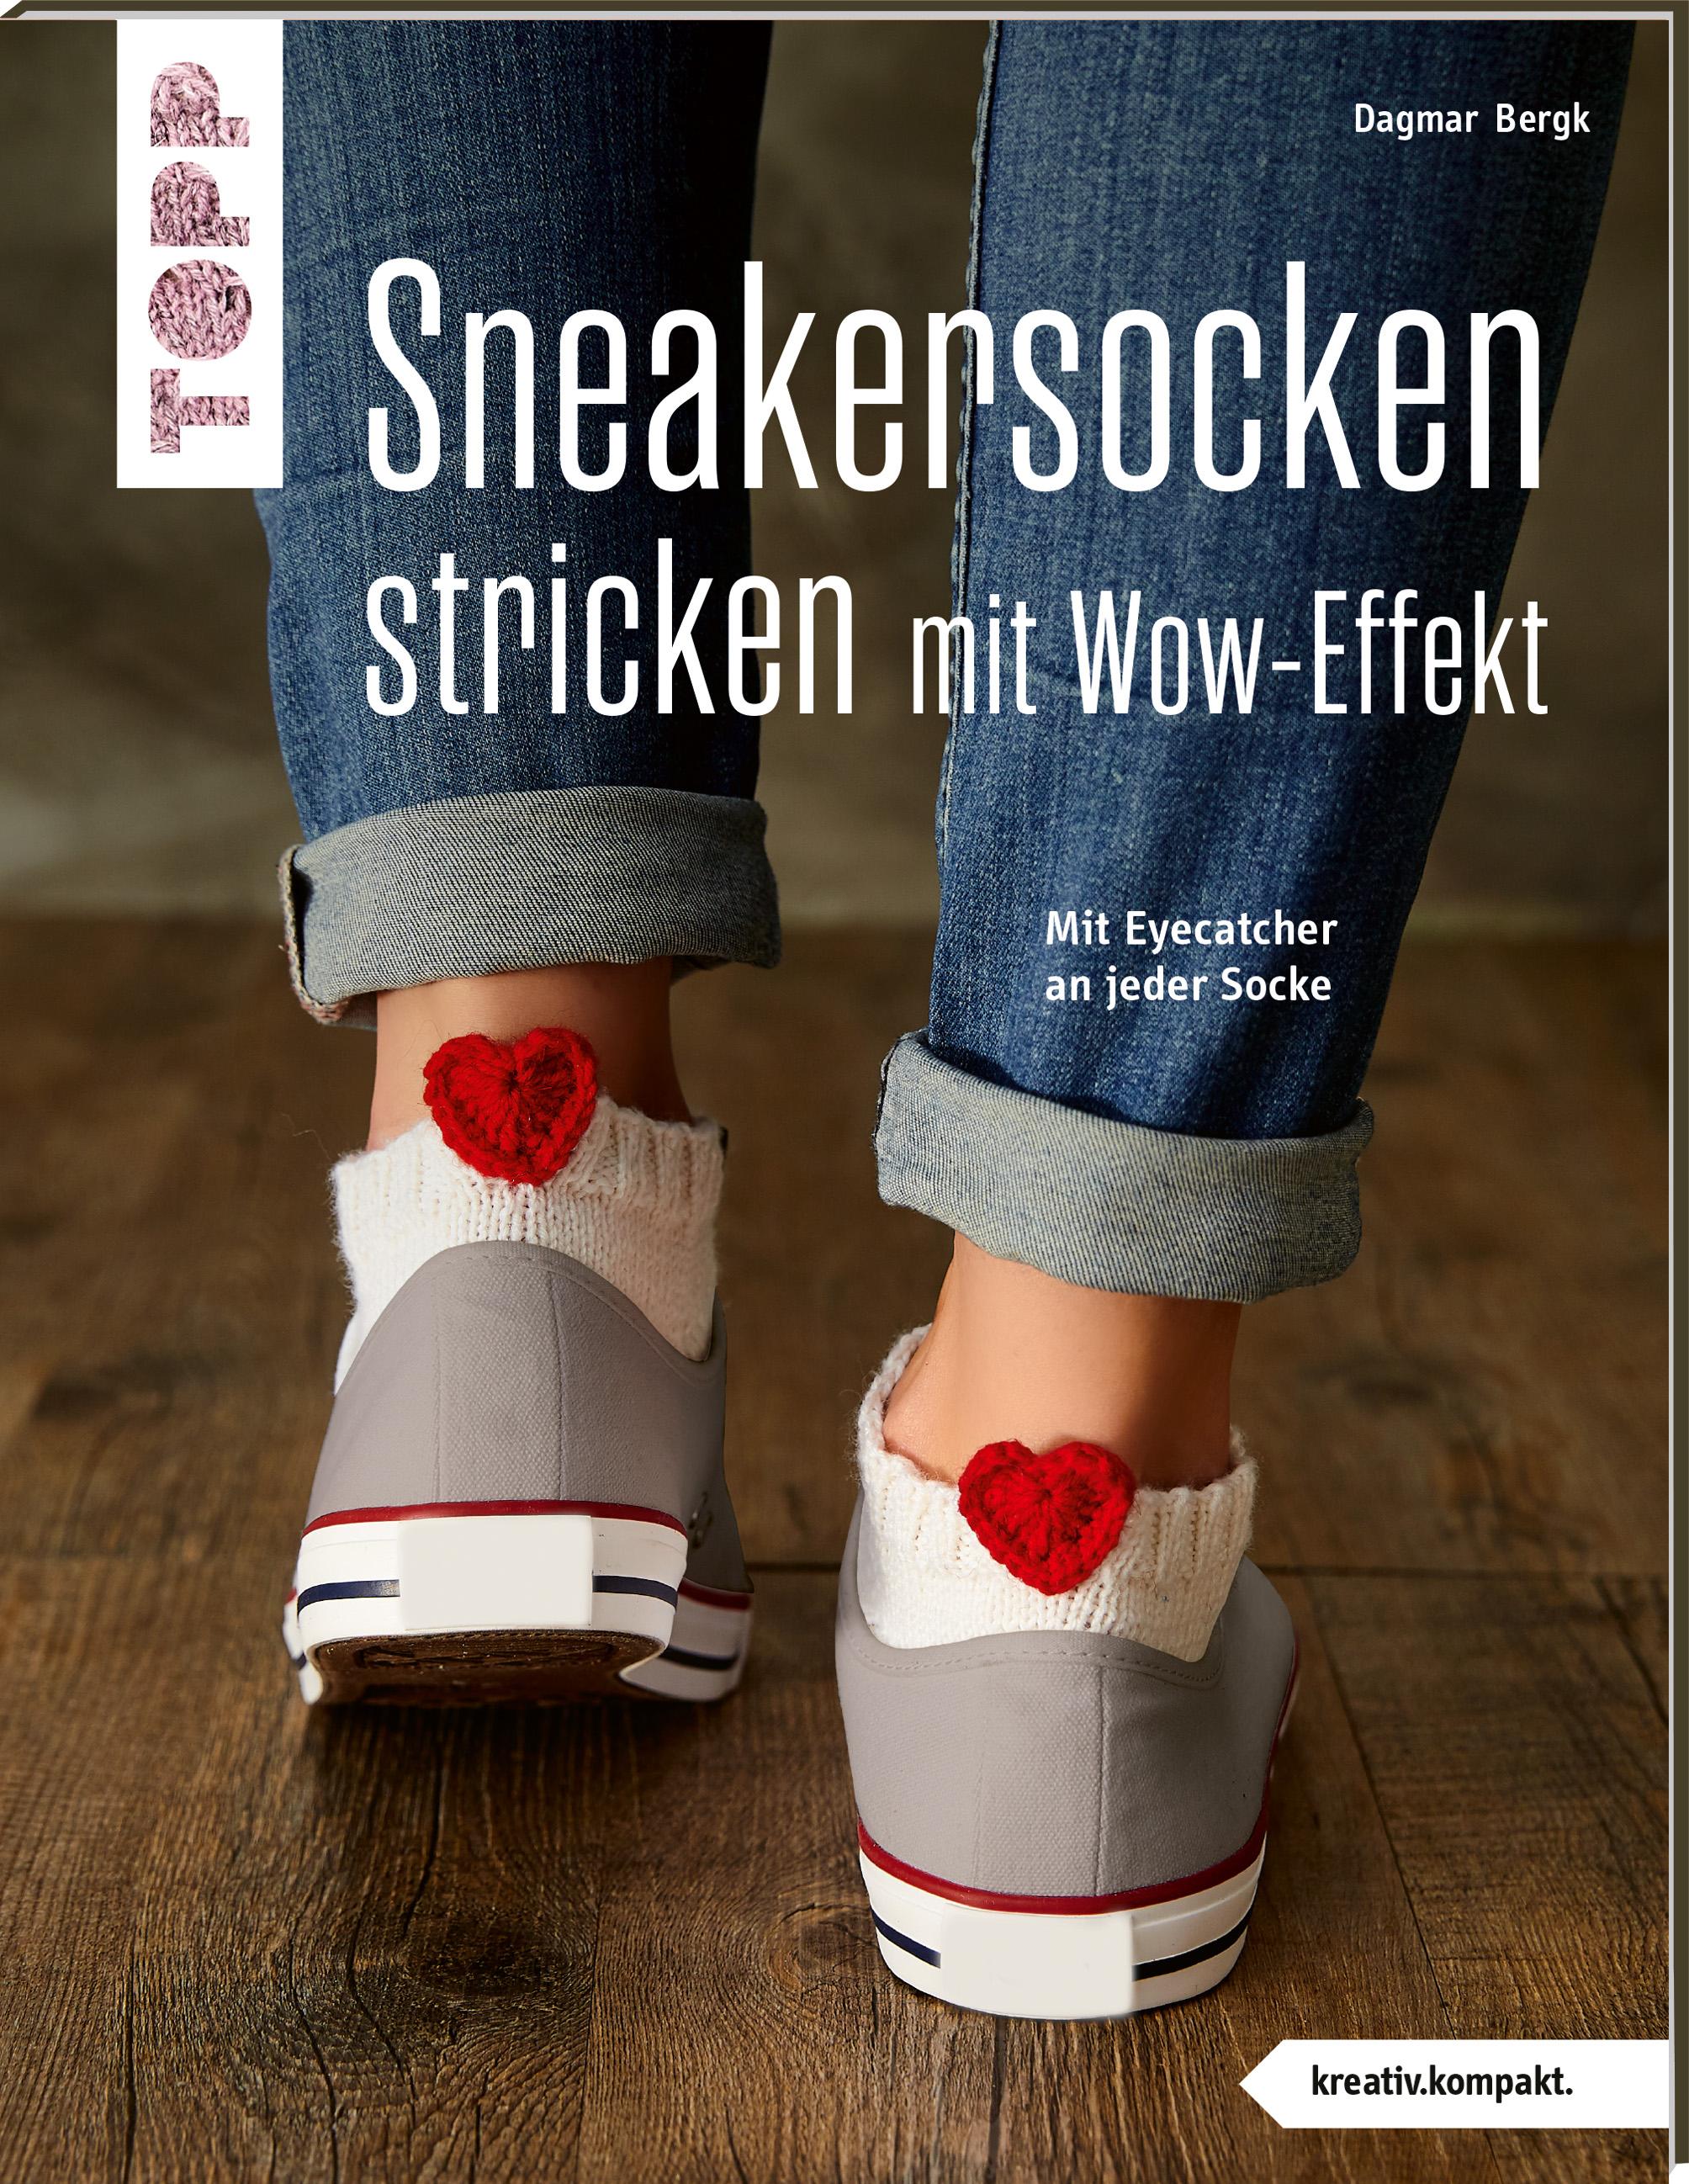 Sneakersocken stricken mit Wow-Effekt (Dagmar Bergk)